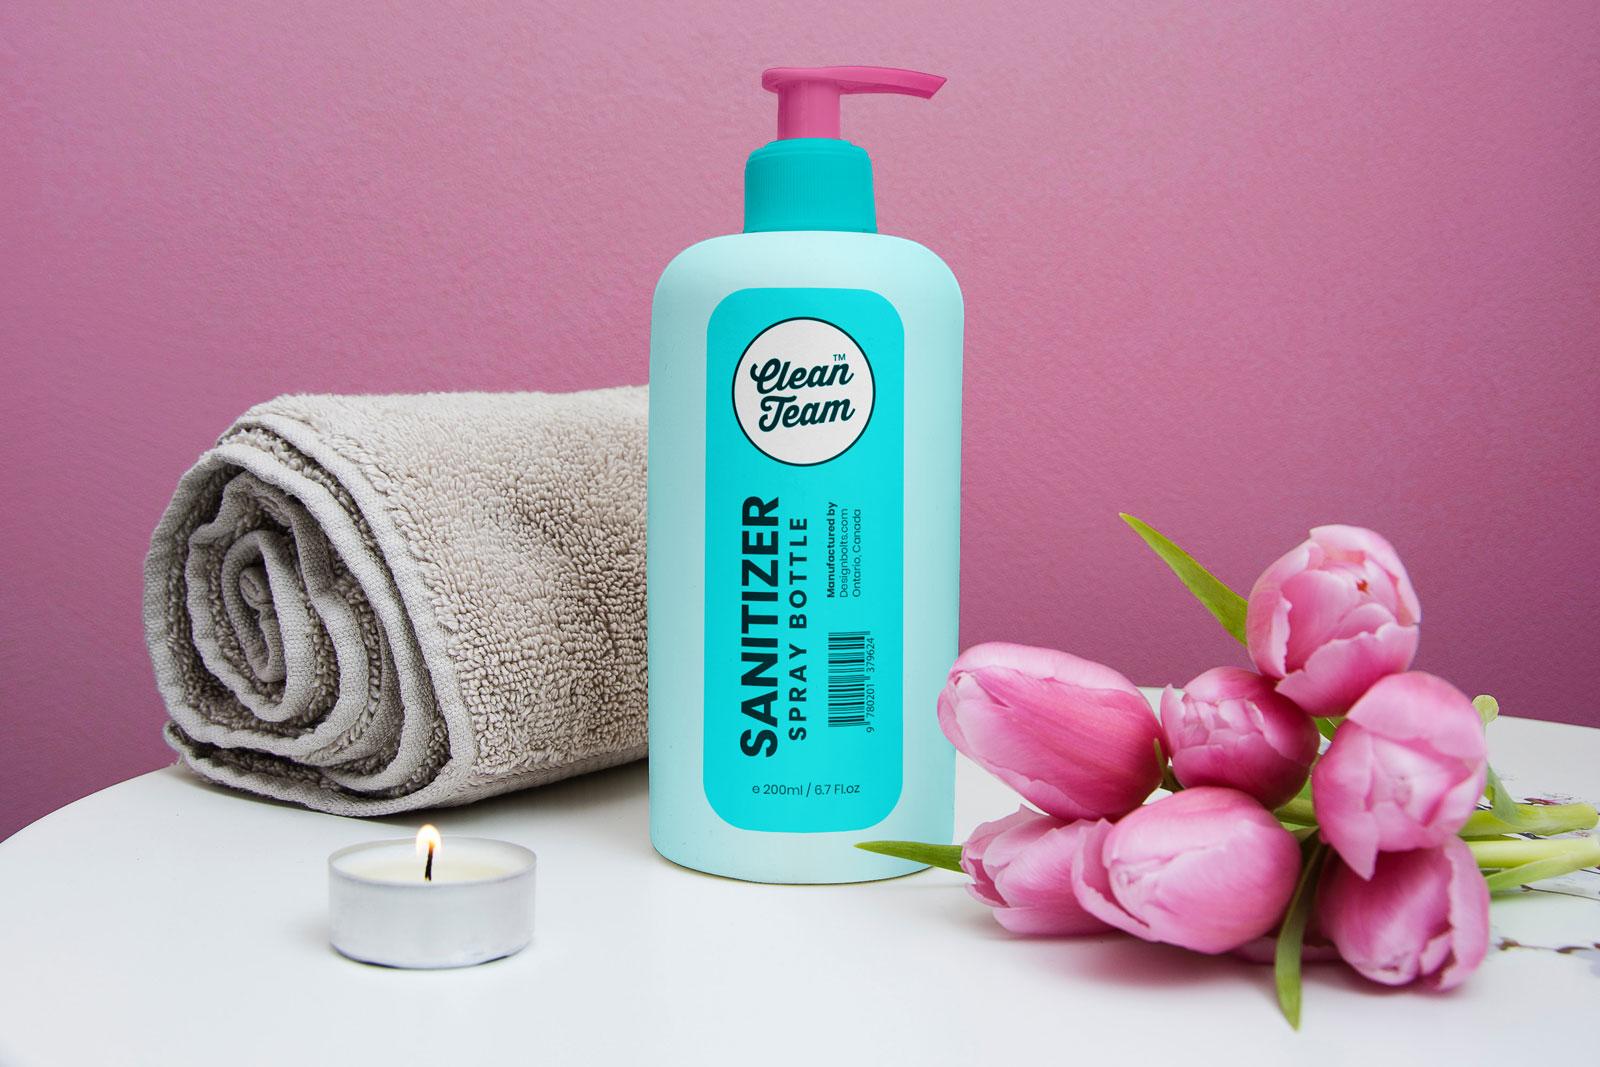 Free-Hand-Sanitizer-Spray-Bottle-Mockup-PSD-2